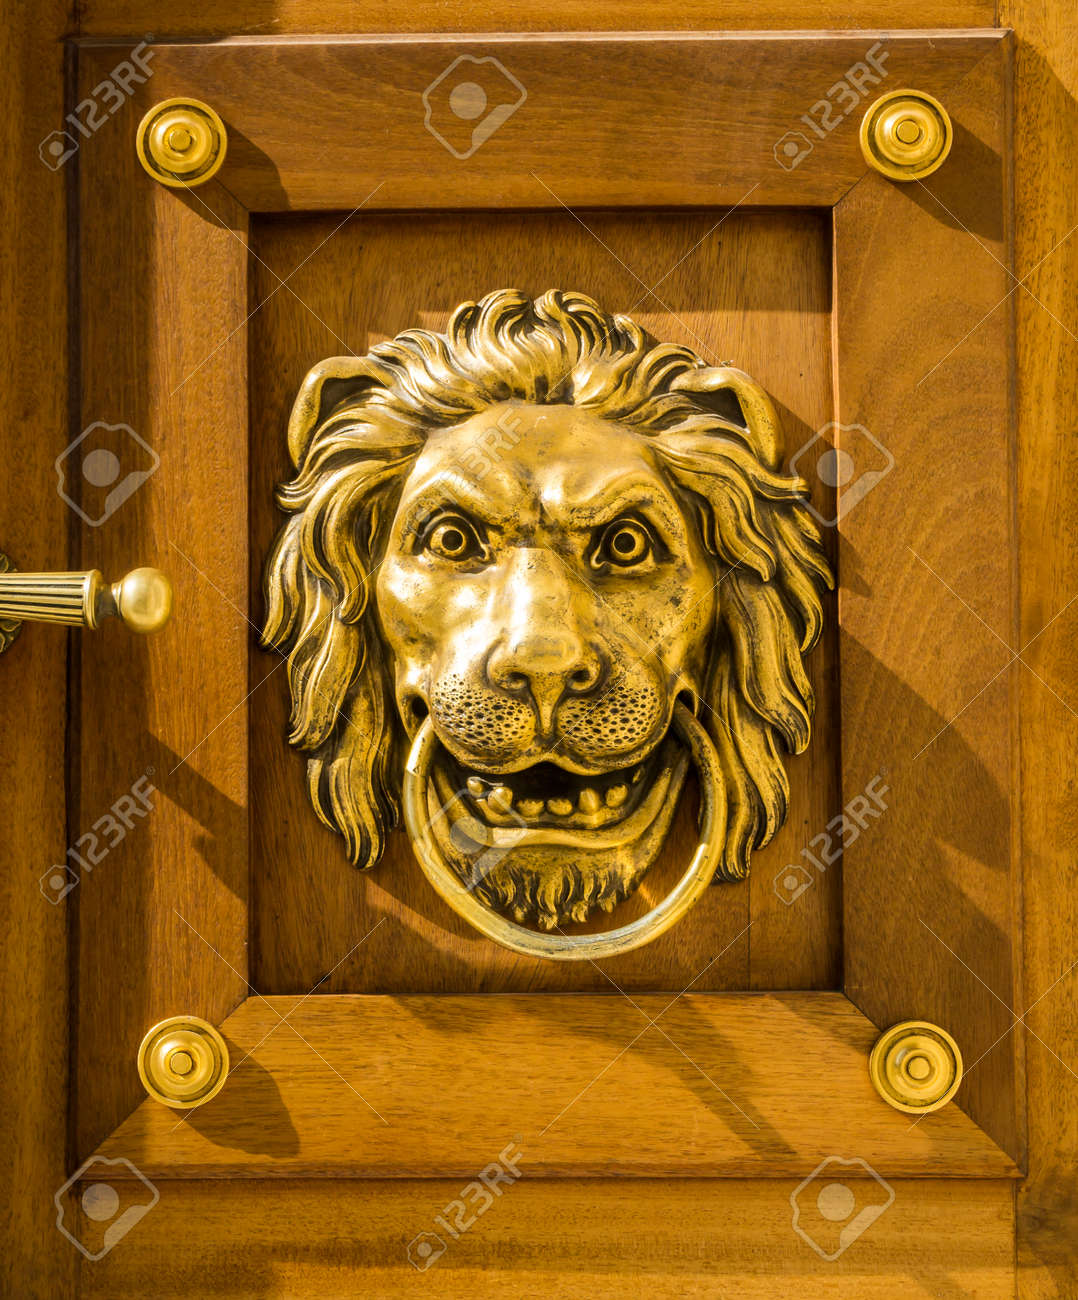 Vintage Door Handle Lion Head Decorative Detail On The Wooden